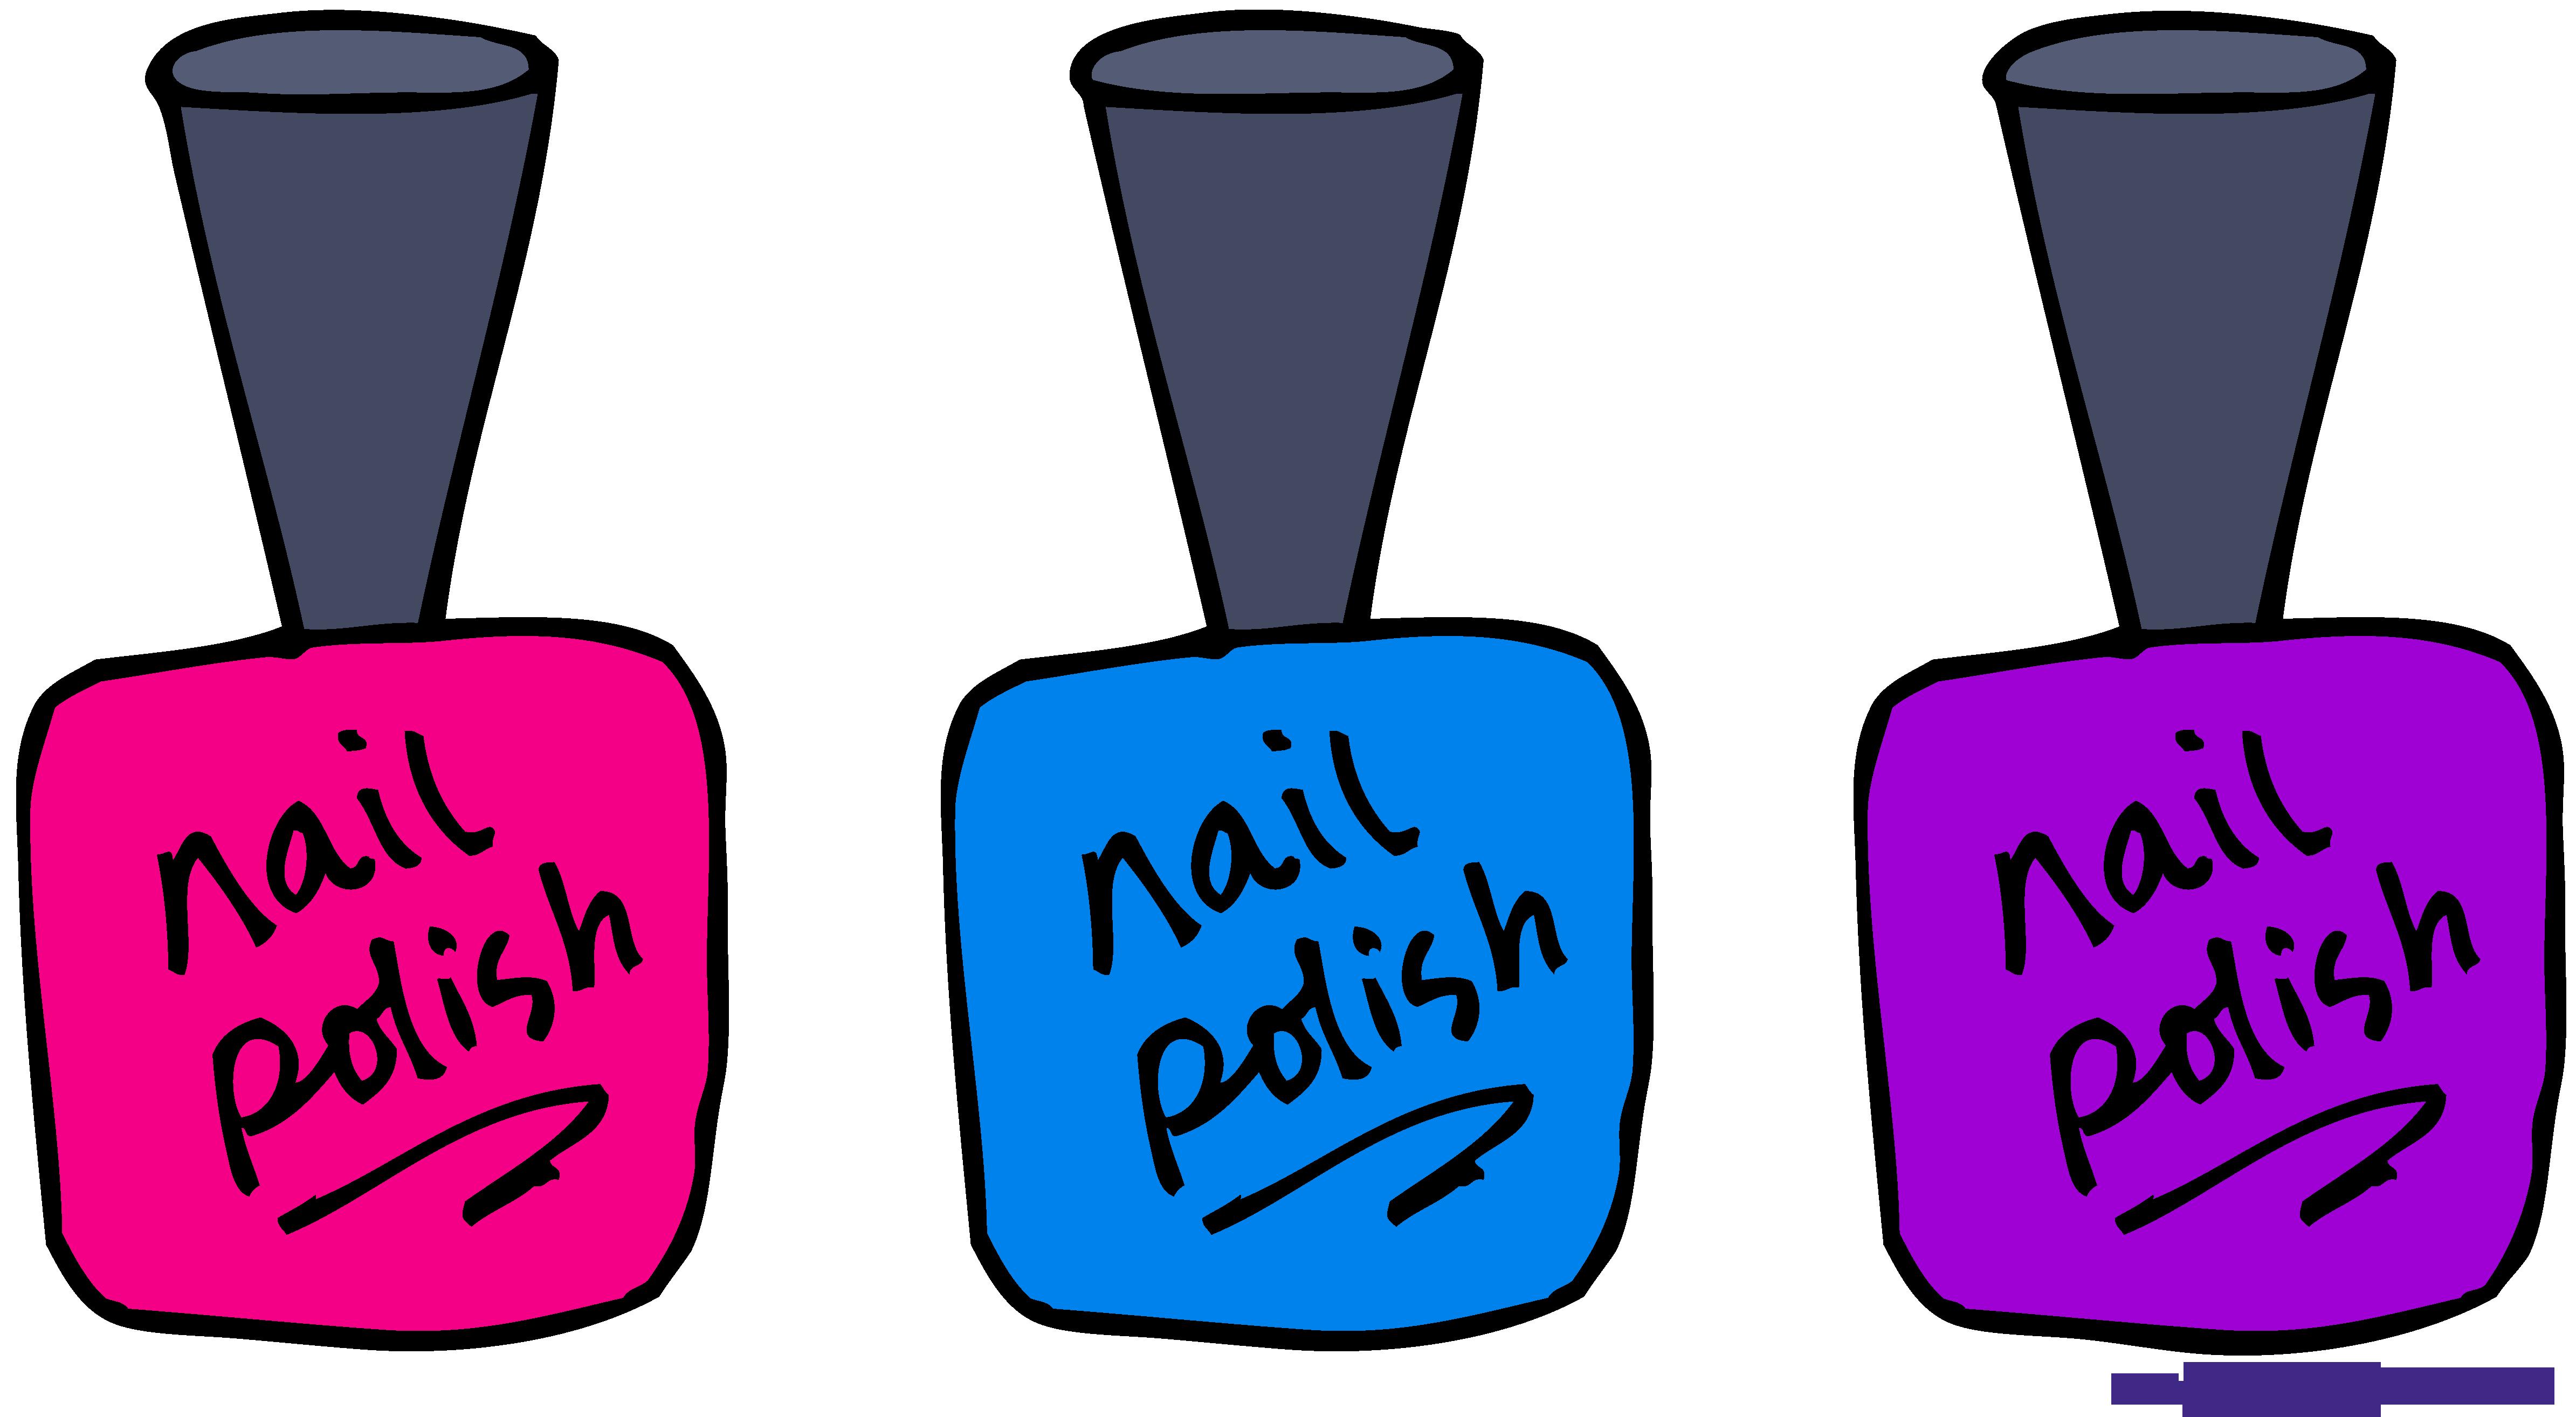 nail polish clip art clipart sweet clip art rh m sweetclipart com nail polish clip art border nail polish clipart black and white